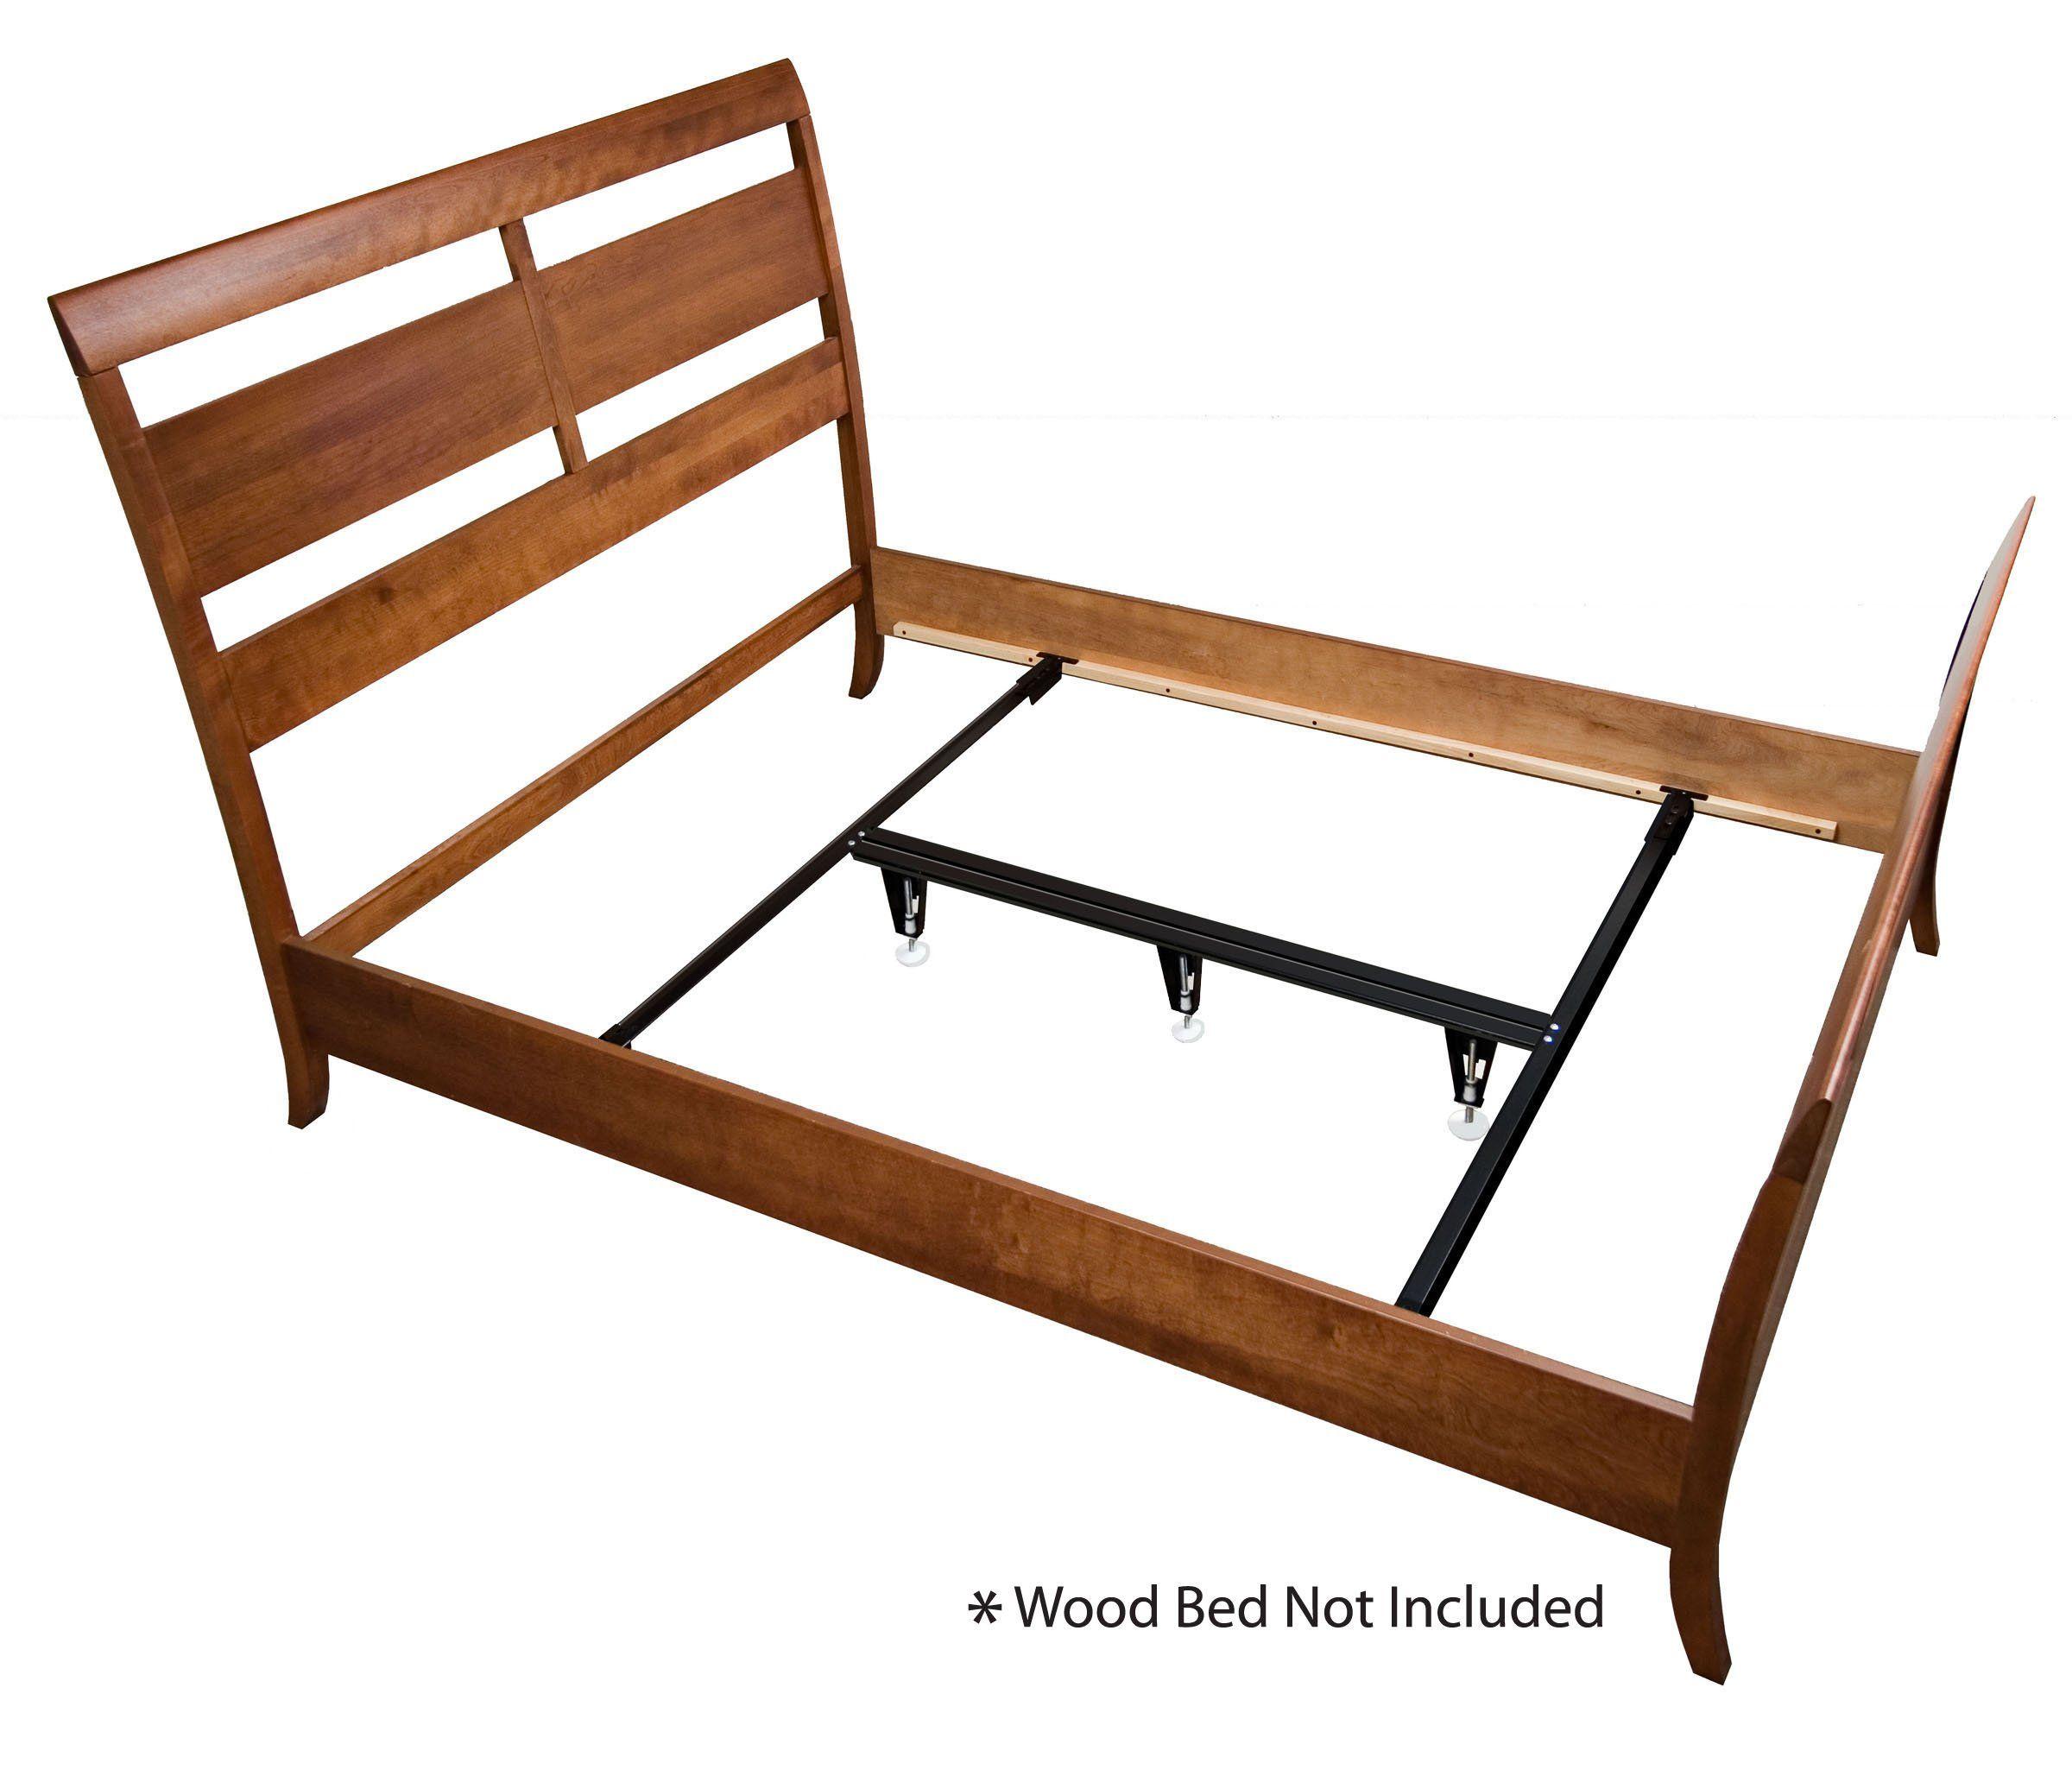 Knickerbocker iSlats - Steel Bed Slats - Bed Frame Center Support ...